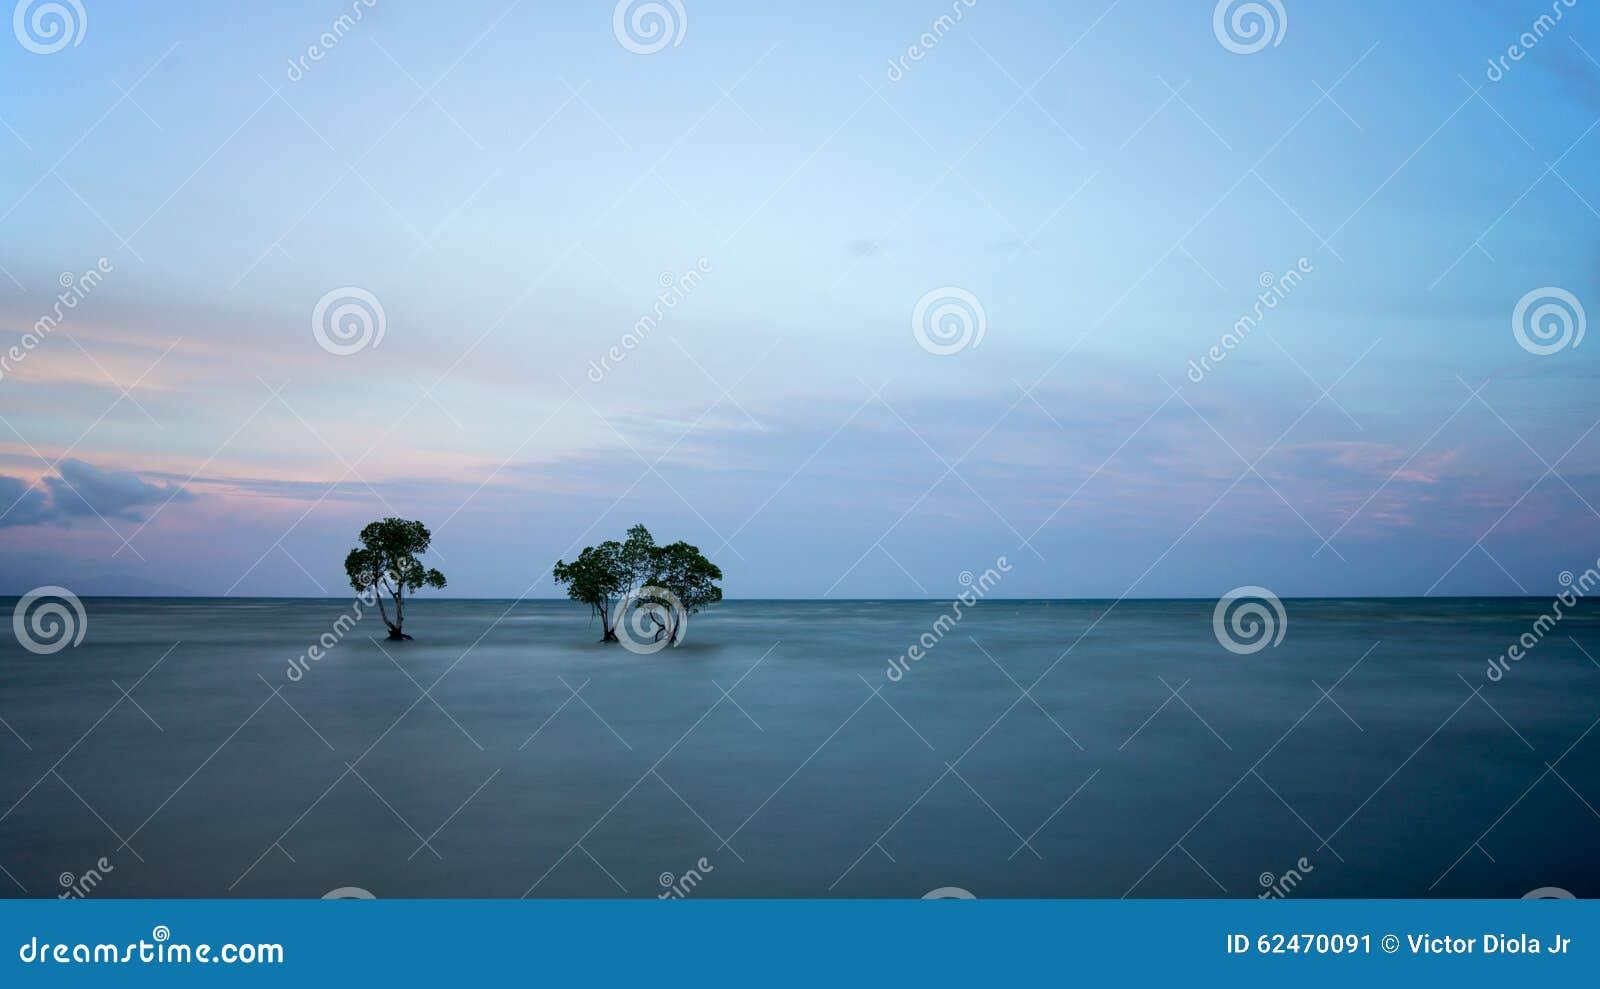 Trees and ocean in long exposure shot